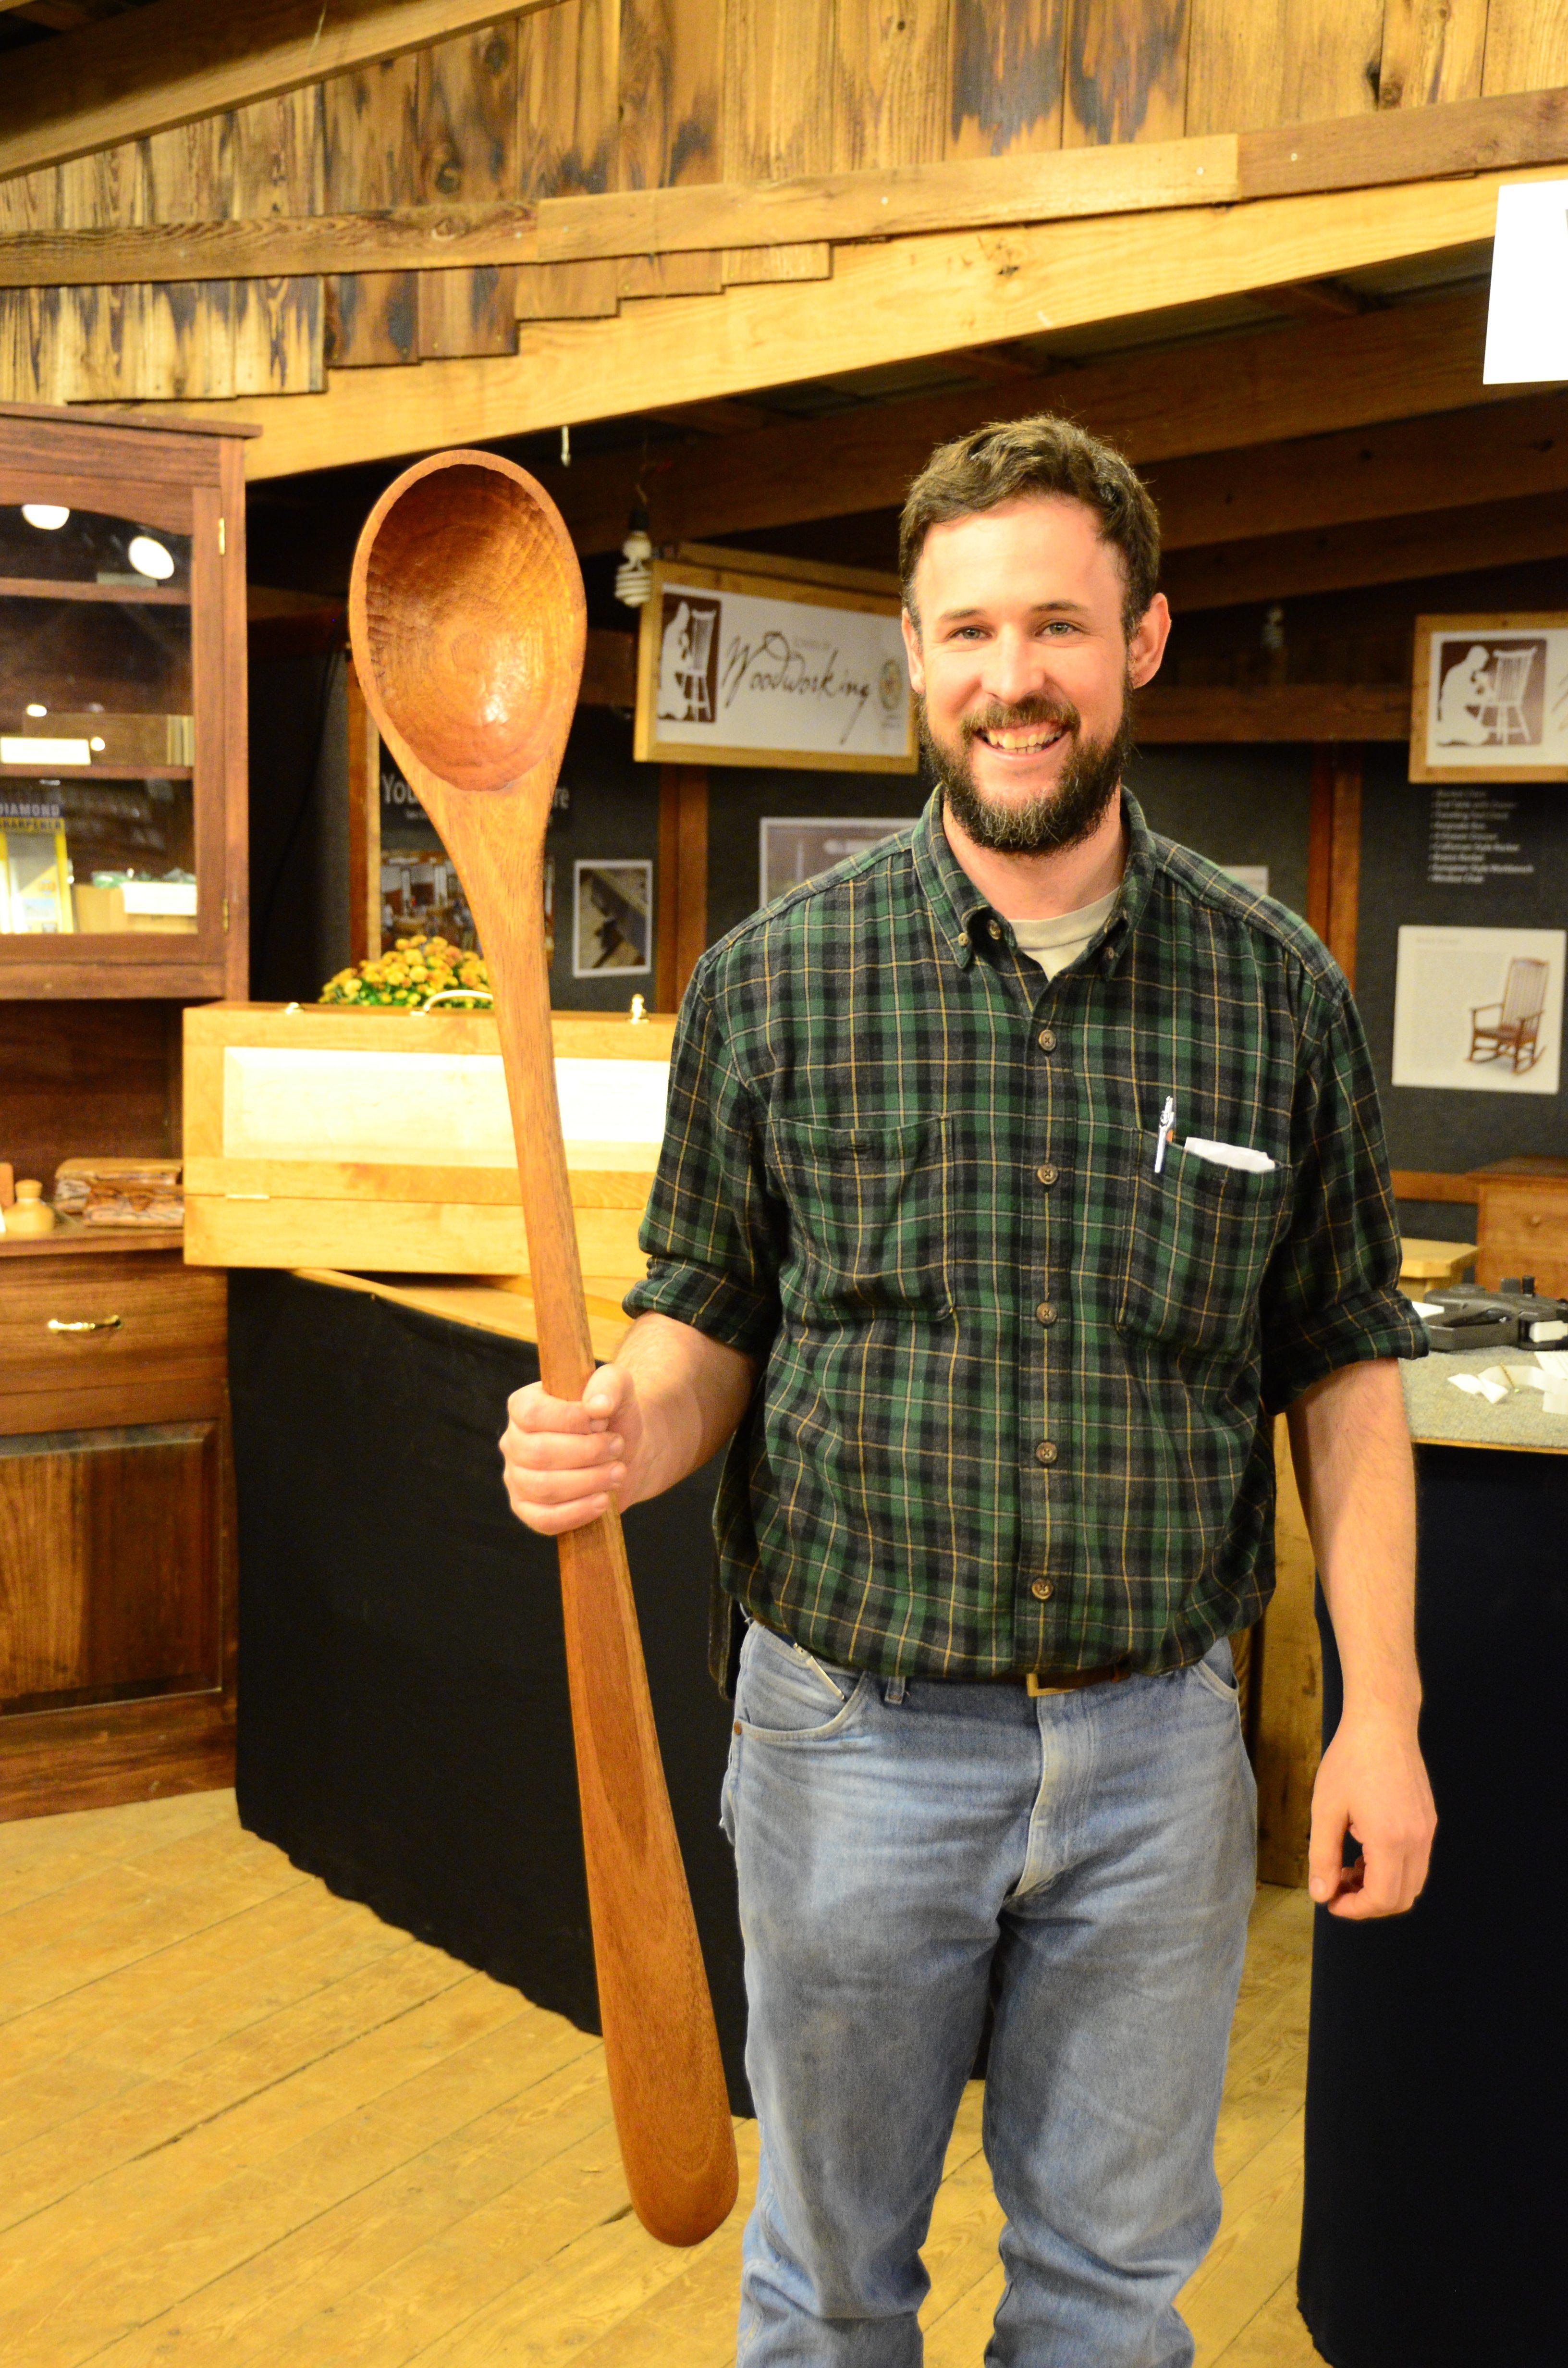 A Spoon As Large As A Man Homestead Fair 2019